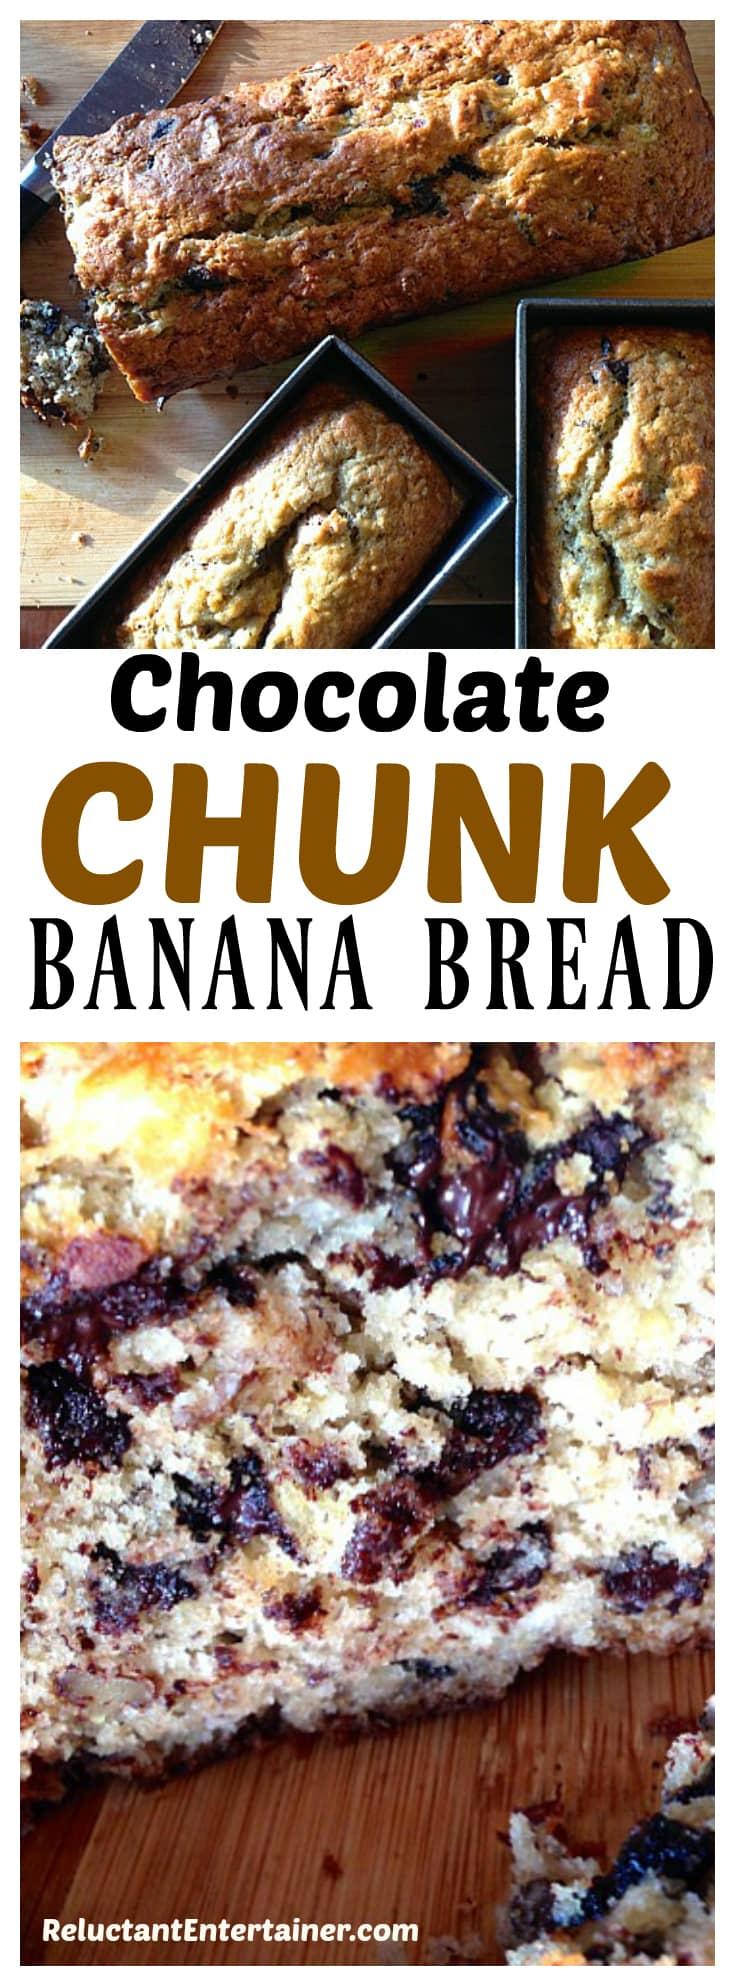 Chocolate Chunk Banana Bread Pecans Recipe